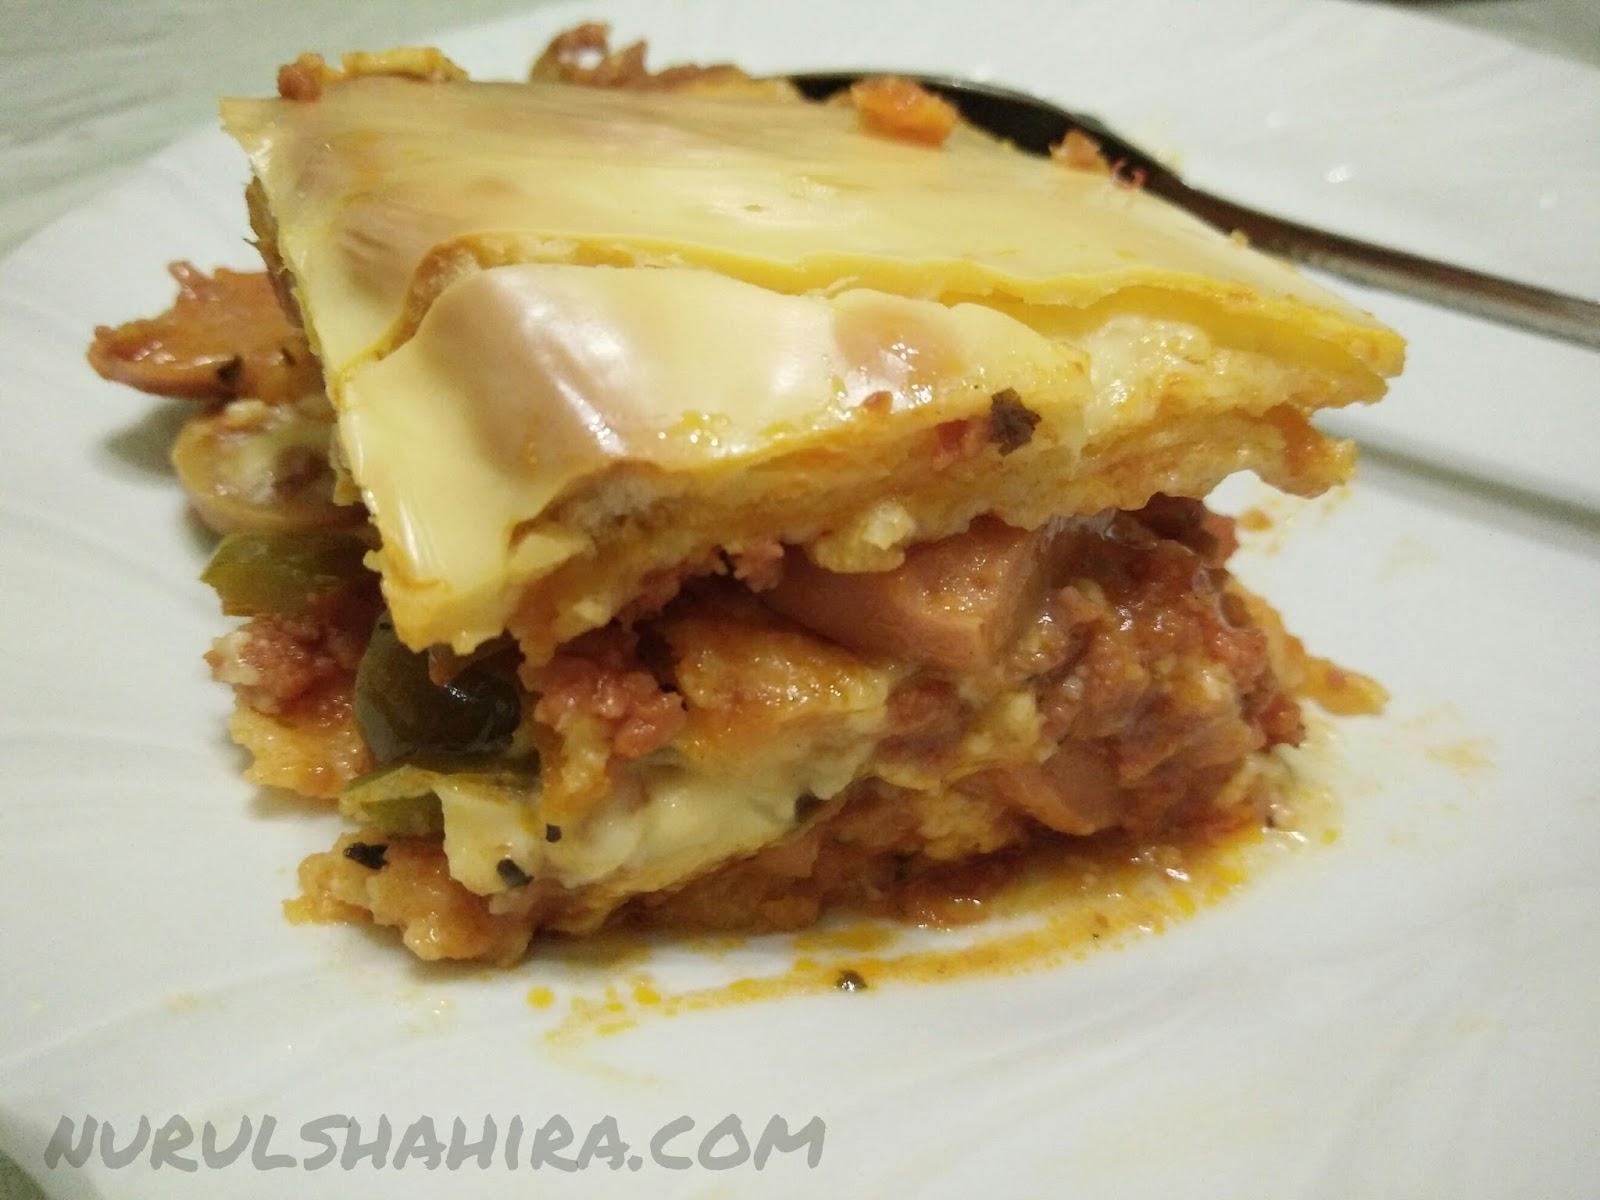 Resepi Homemade Beef Lasagna Guna Roti - nurulshahira.com